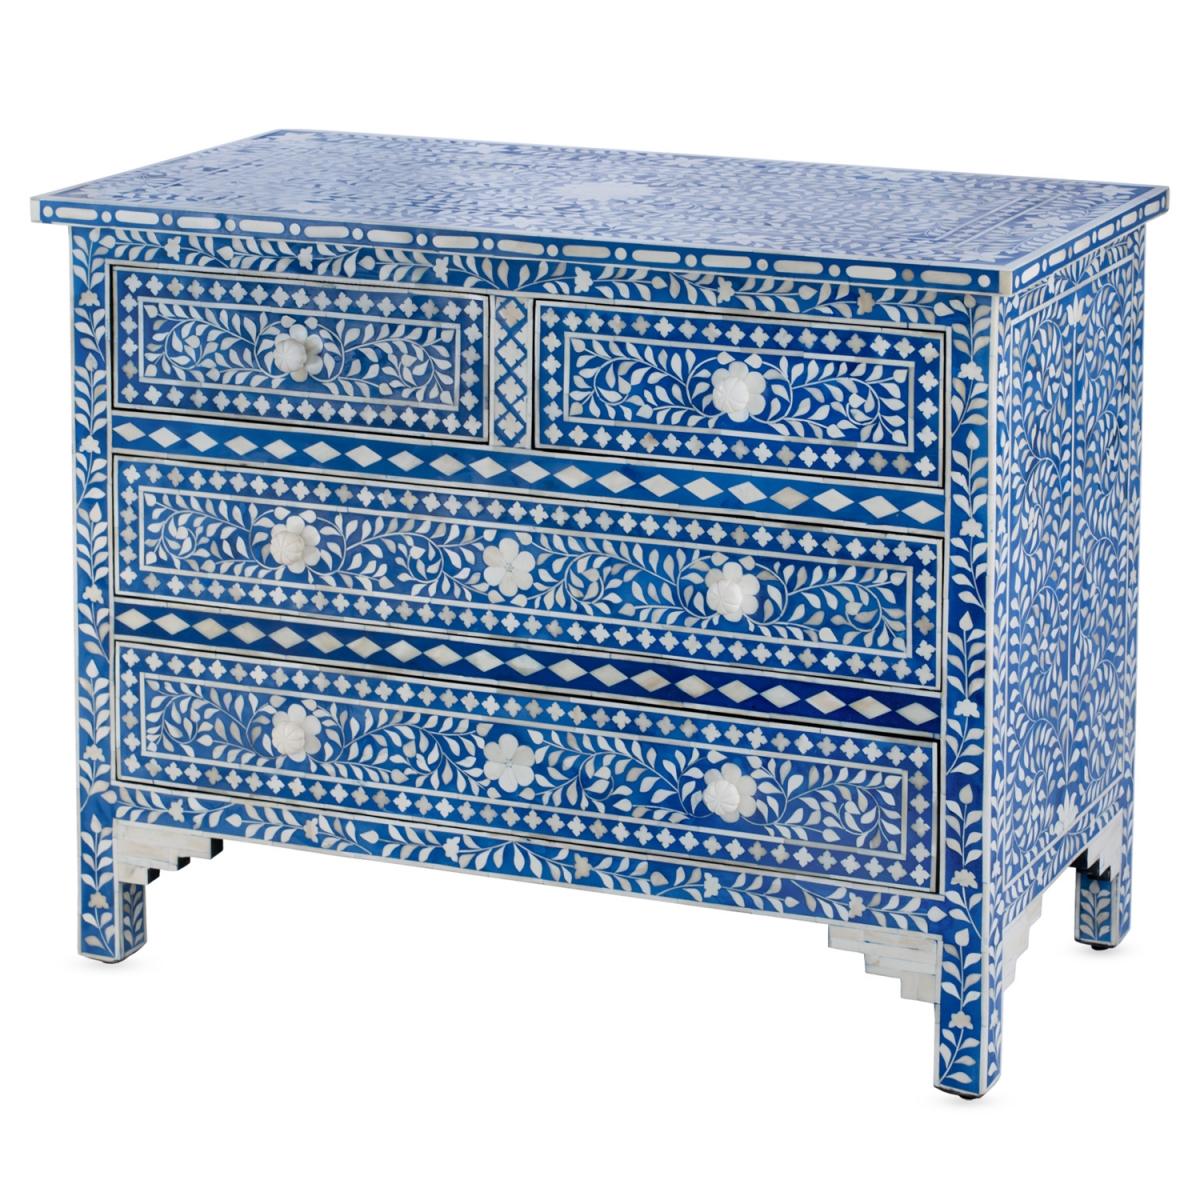 Комод Синий узор отделка кость Bone Inlay Dresser Blue Floral Design Chest of Drawers  - фото 1